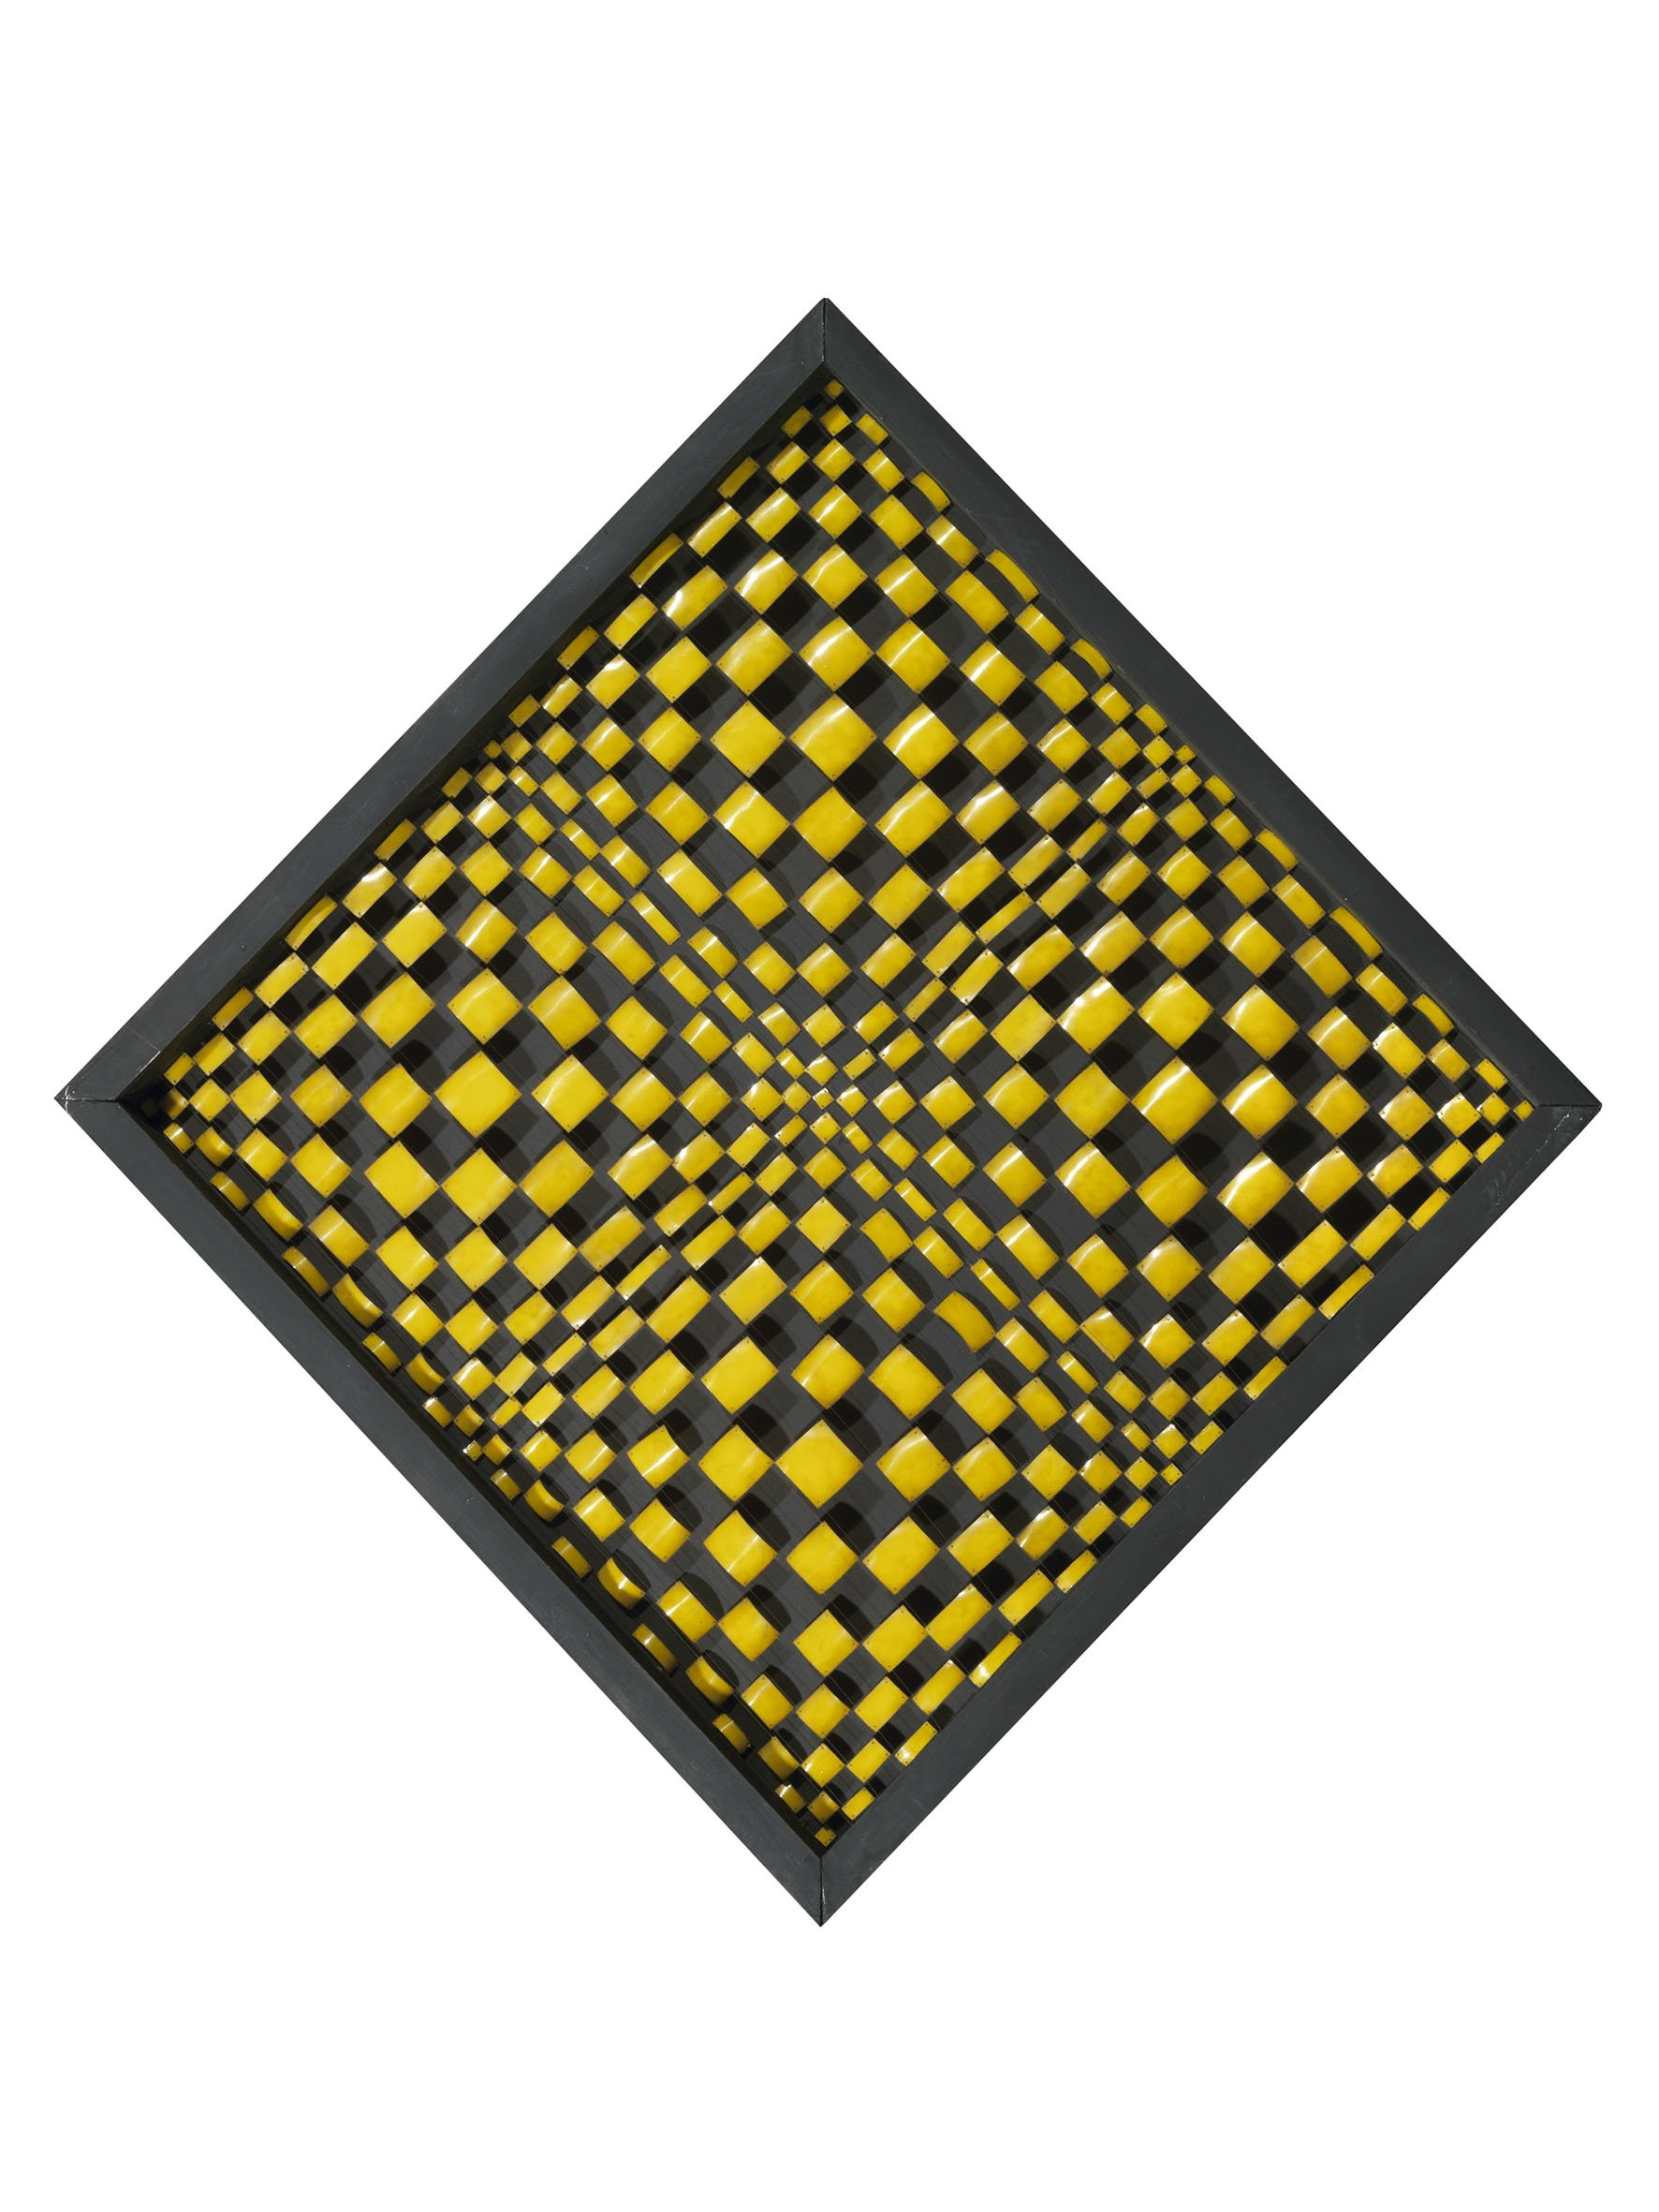 Dadamaino, Oggetto ottico-dinamico, 1960-1961, milled aluminium plates on nylon threads on wooden structure, 37,79 x 37,79 inch